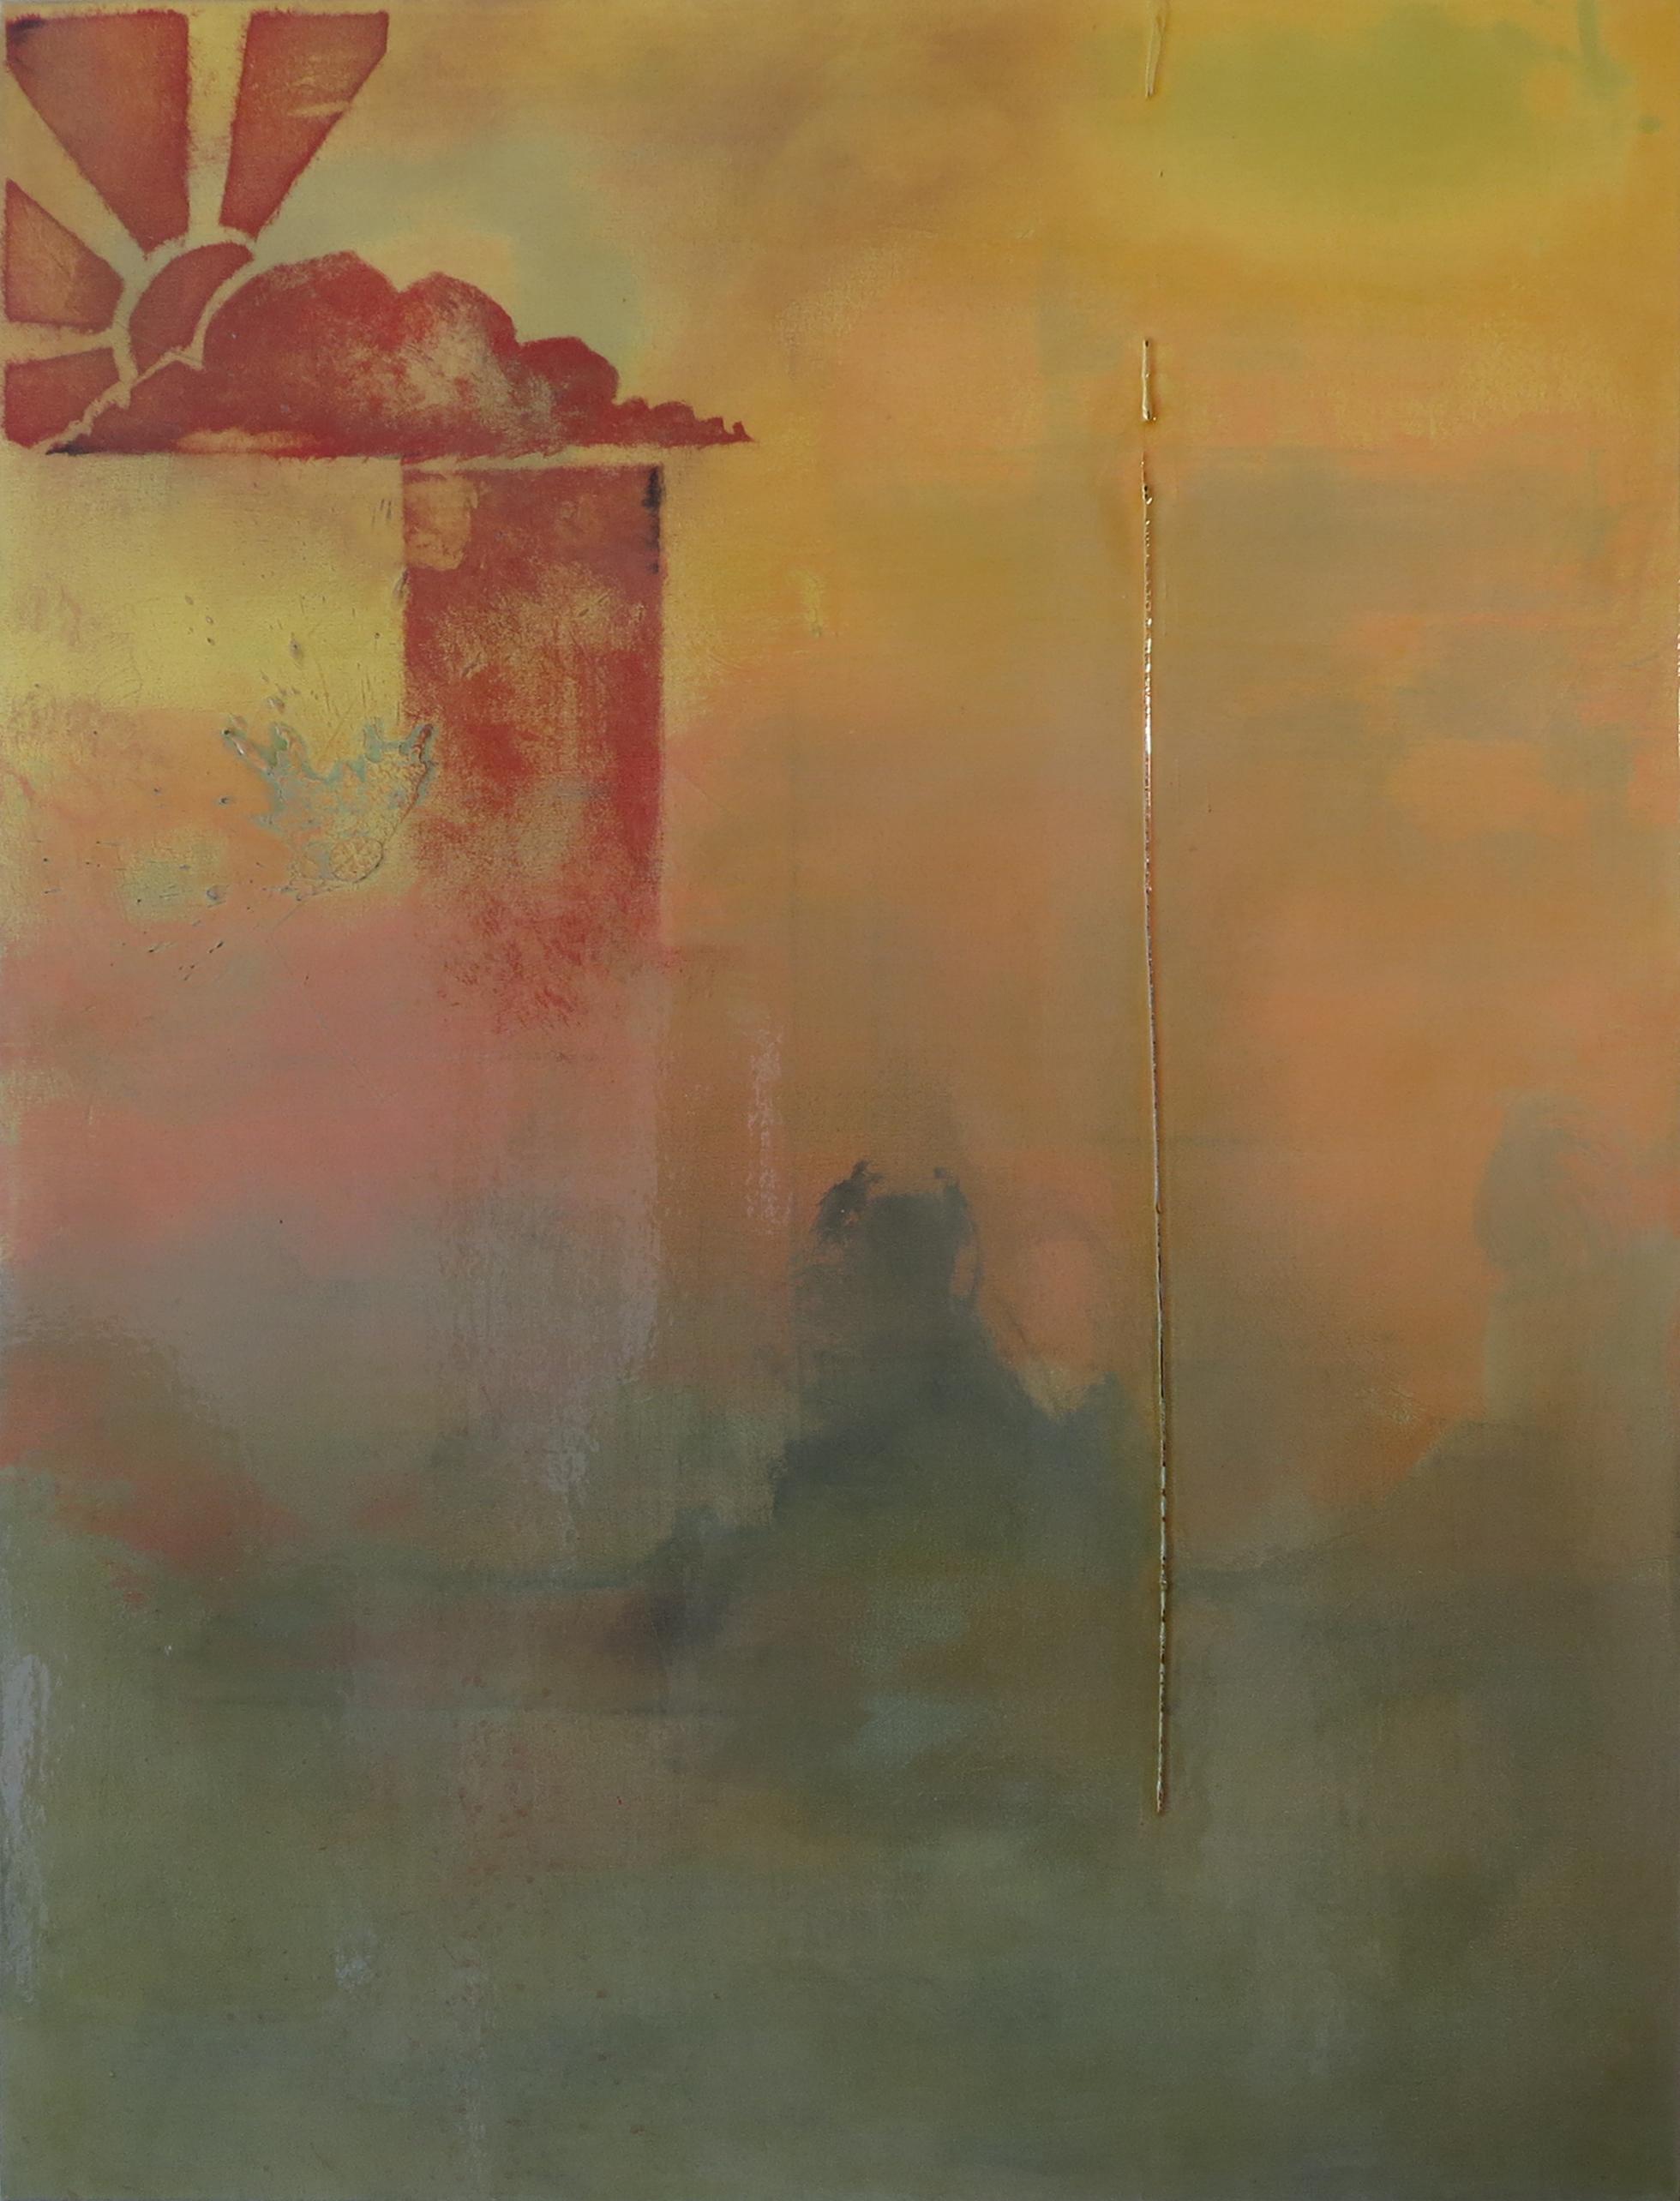 "PEACE HILL I   2013  Series: Piece Hill  Acrylic, Wax, Varnish on Canvas  30x40"""